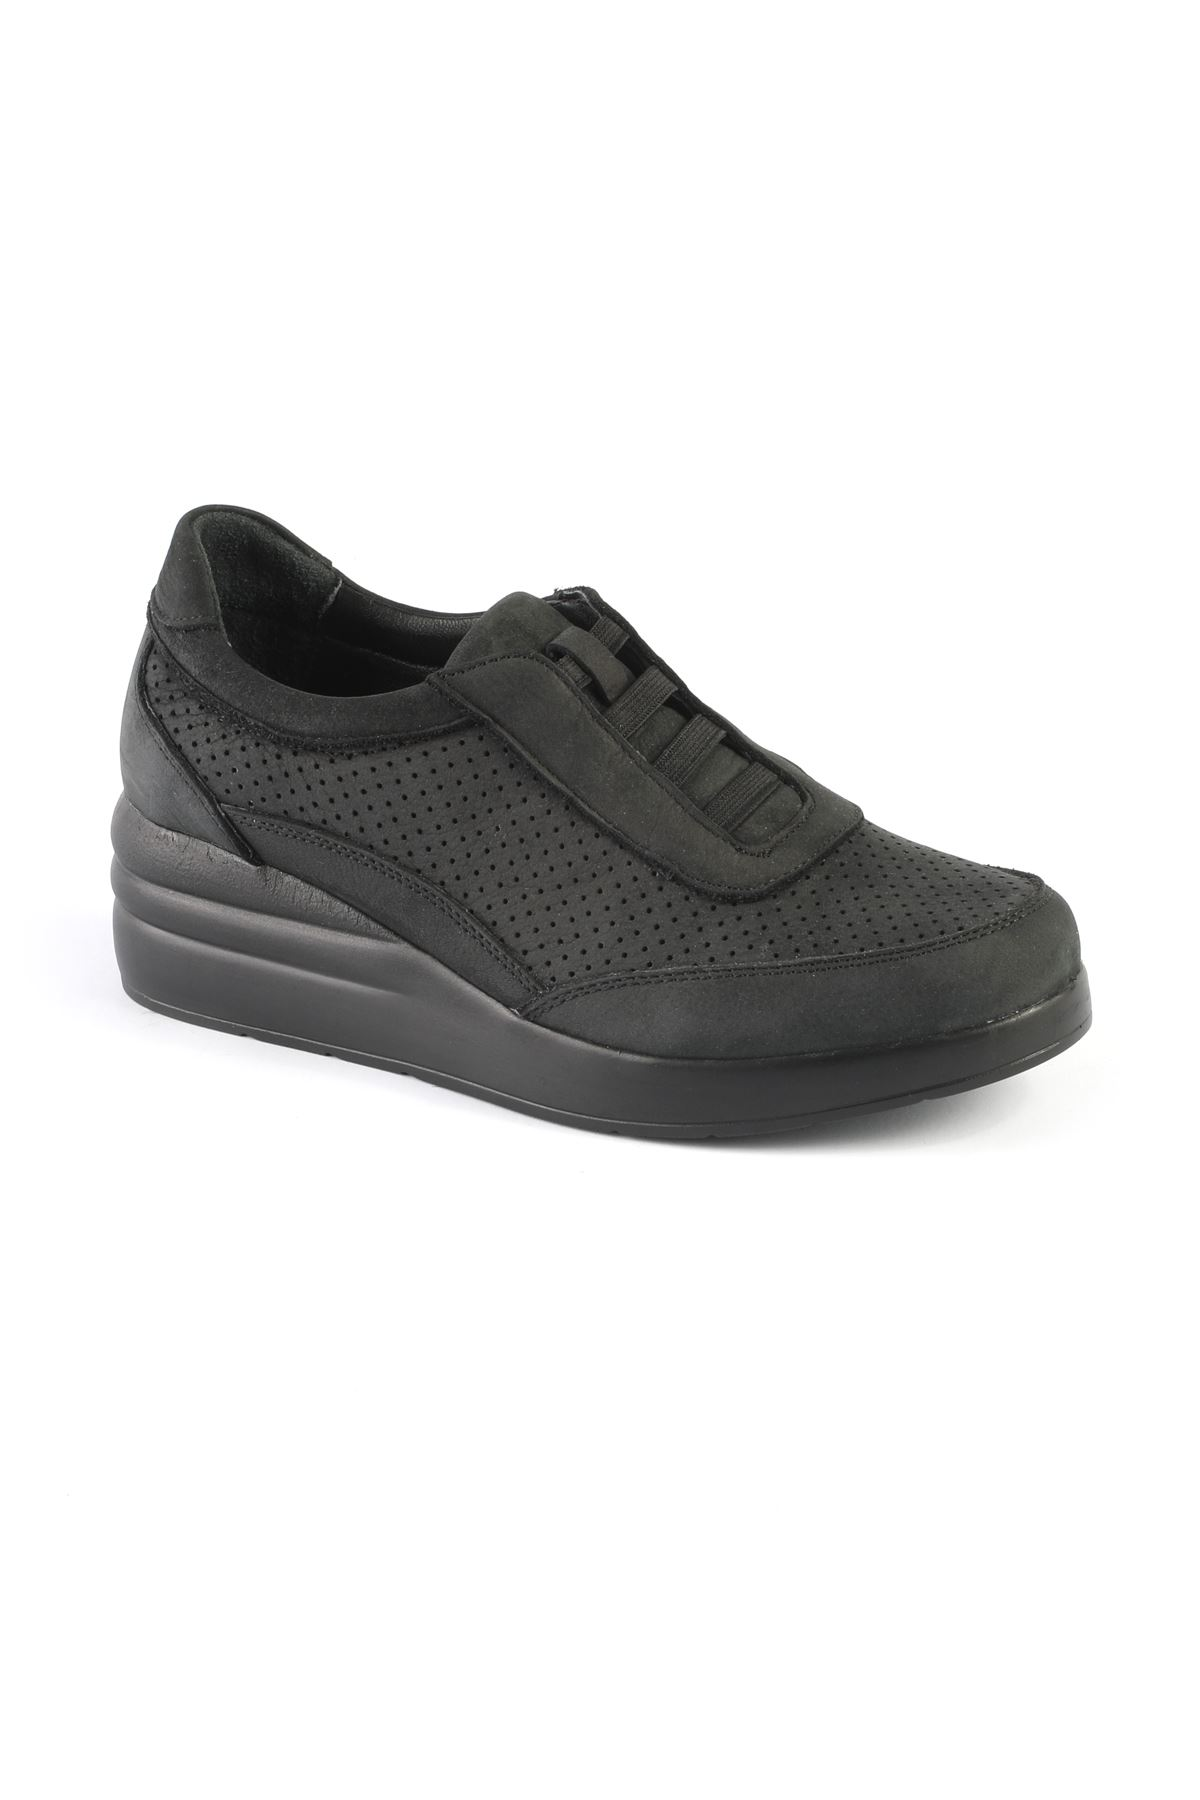 Libero FMS220 Black Sports Shoes